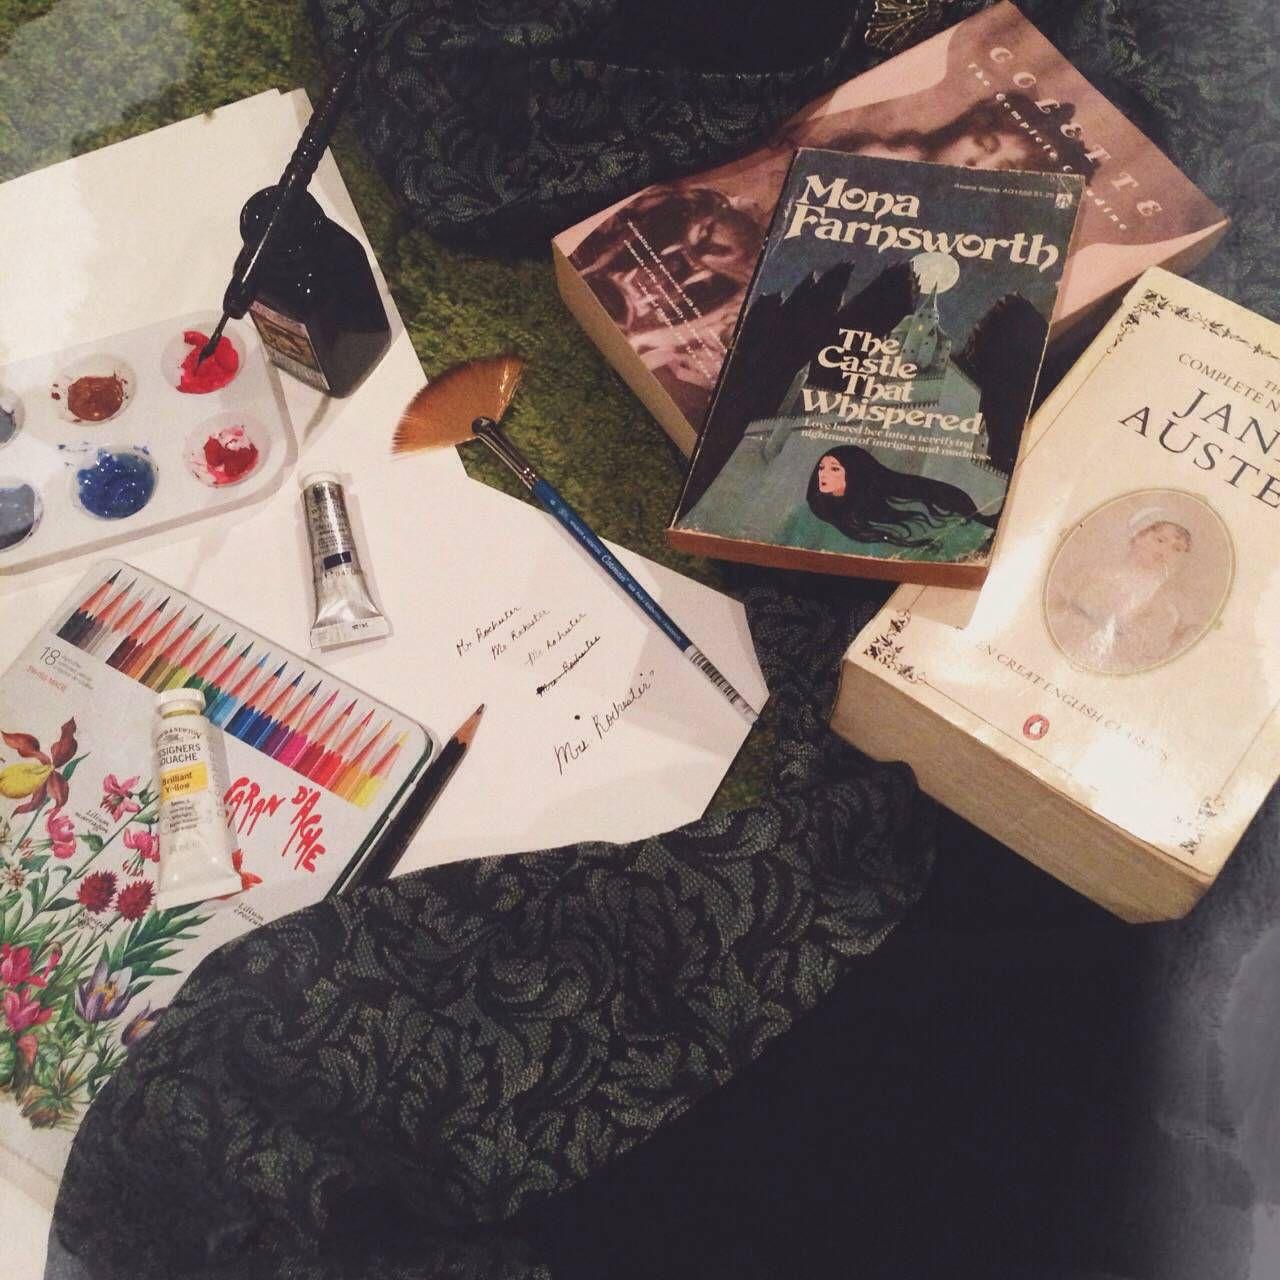 Jane-Eyre-Painting-Instagram